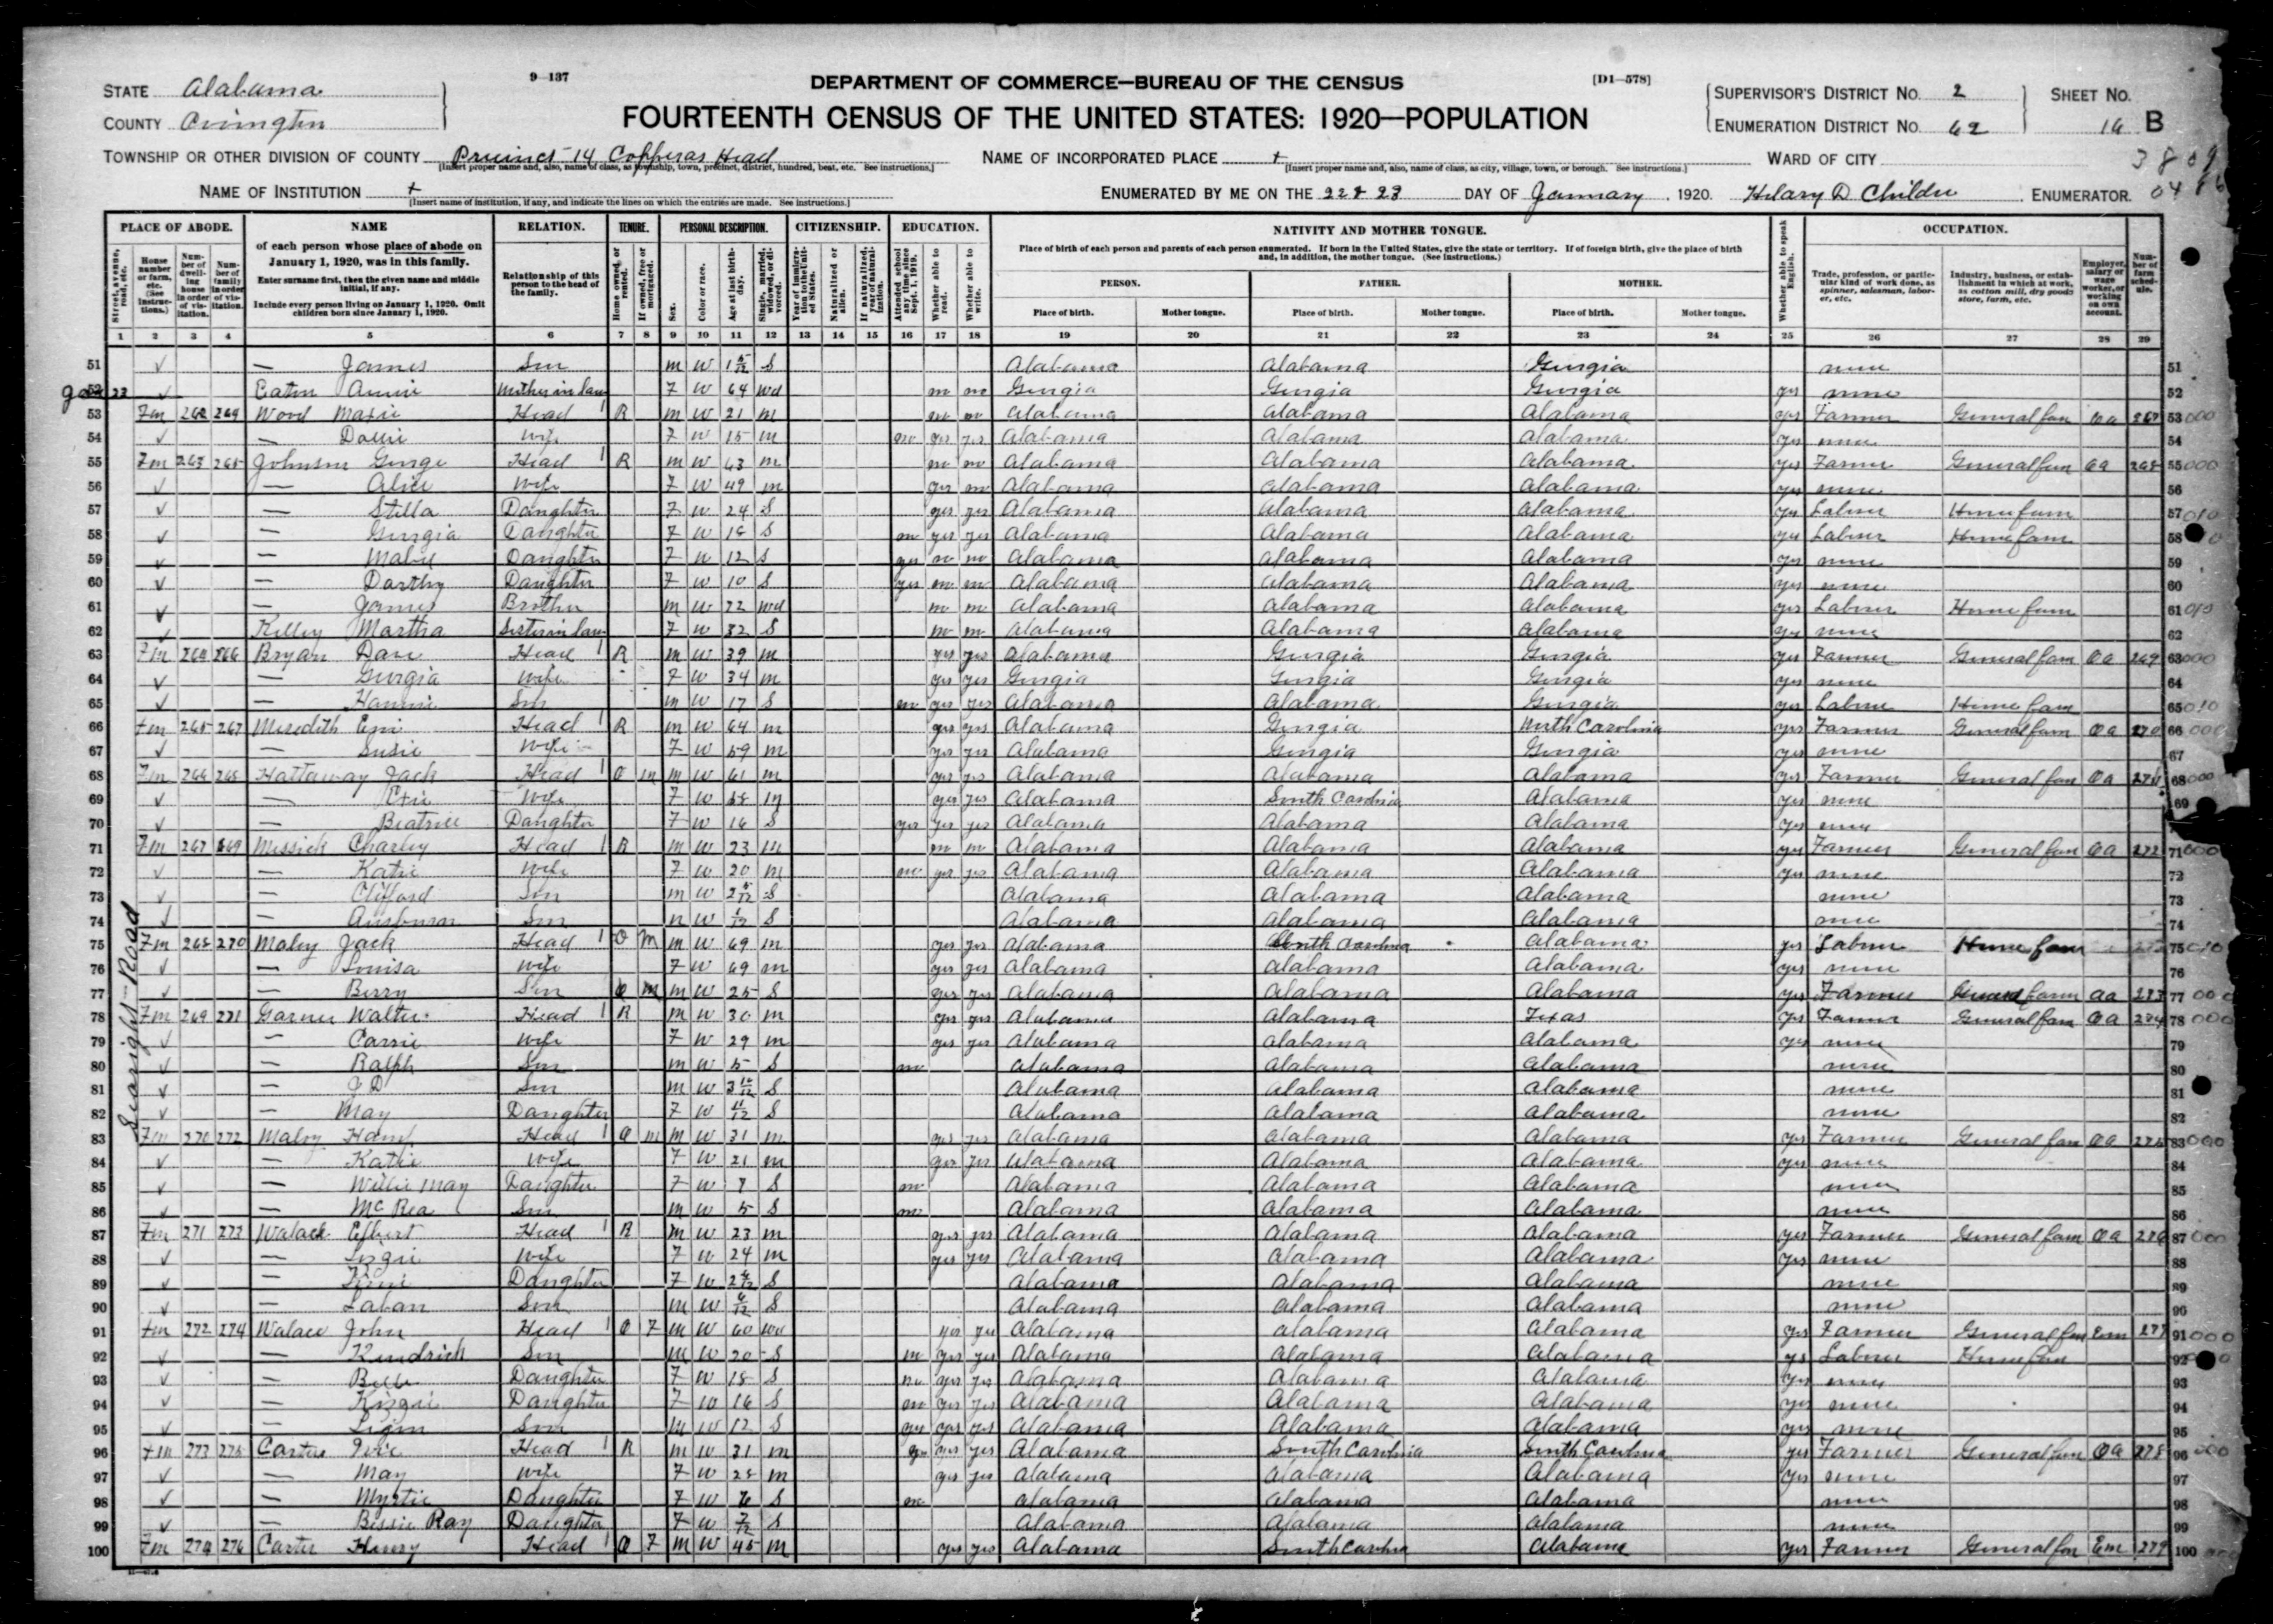 Alabama: COVINGTON County, Enumeration District 62, Sheet No. 16B